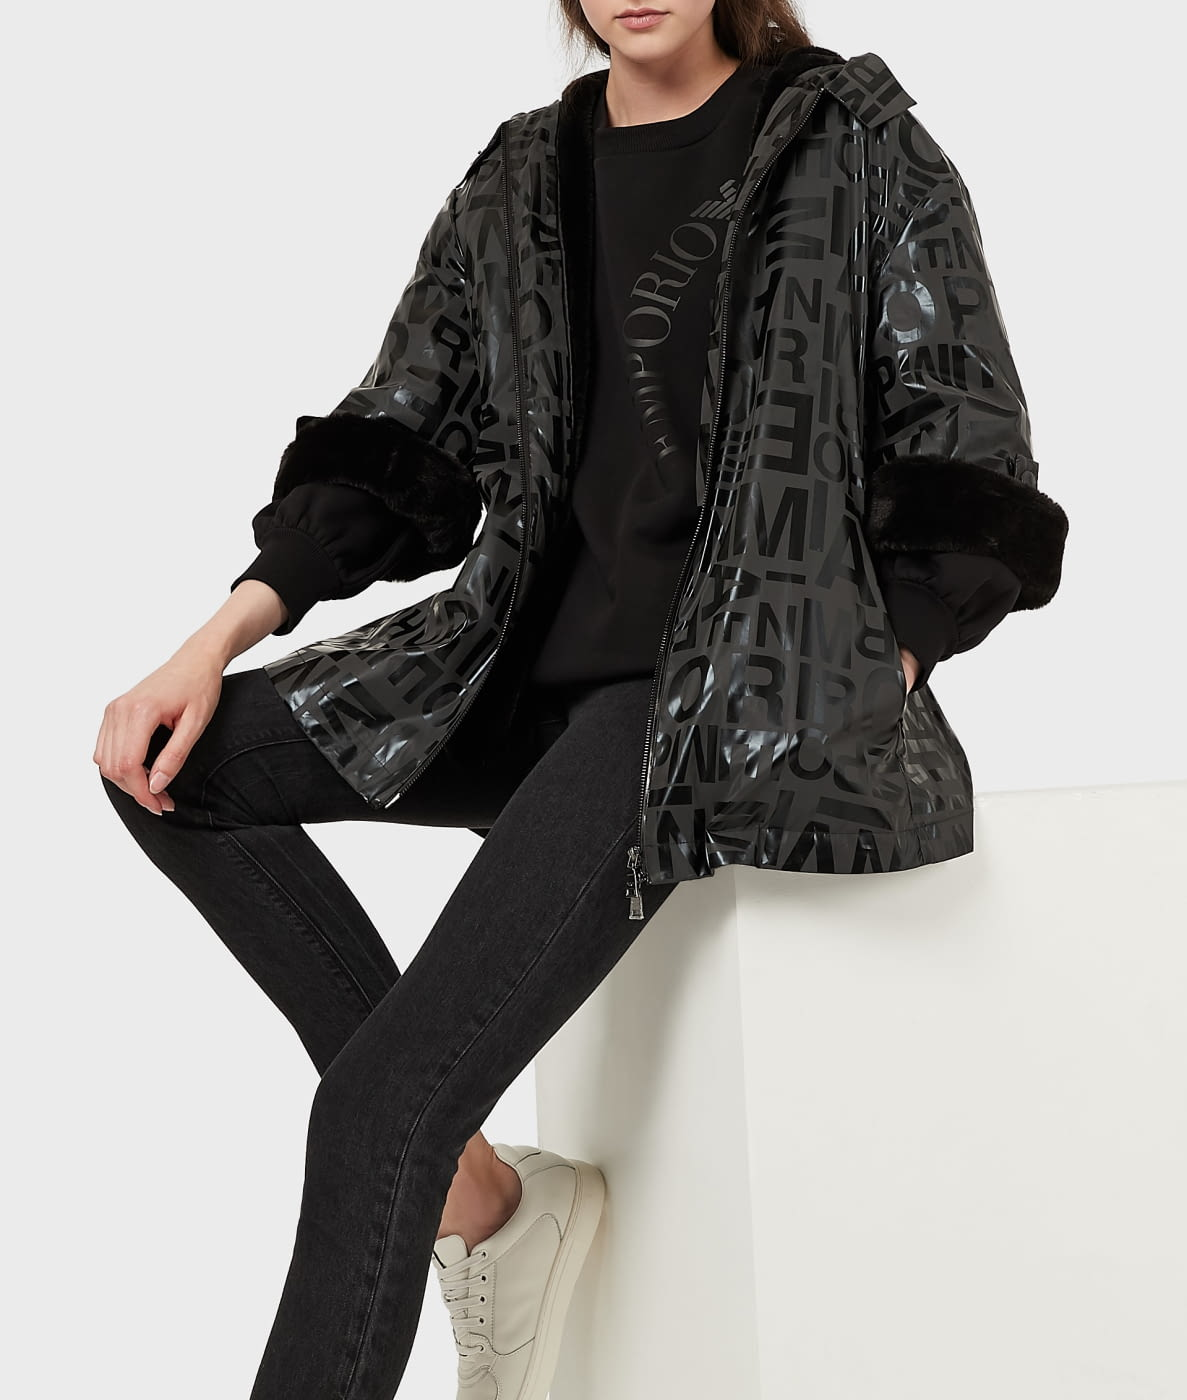 EMPORIO ARMANI chaqueta gris/negro logotipo